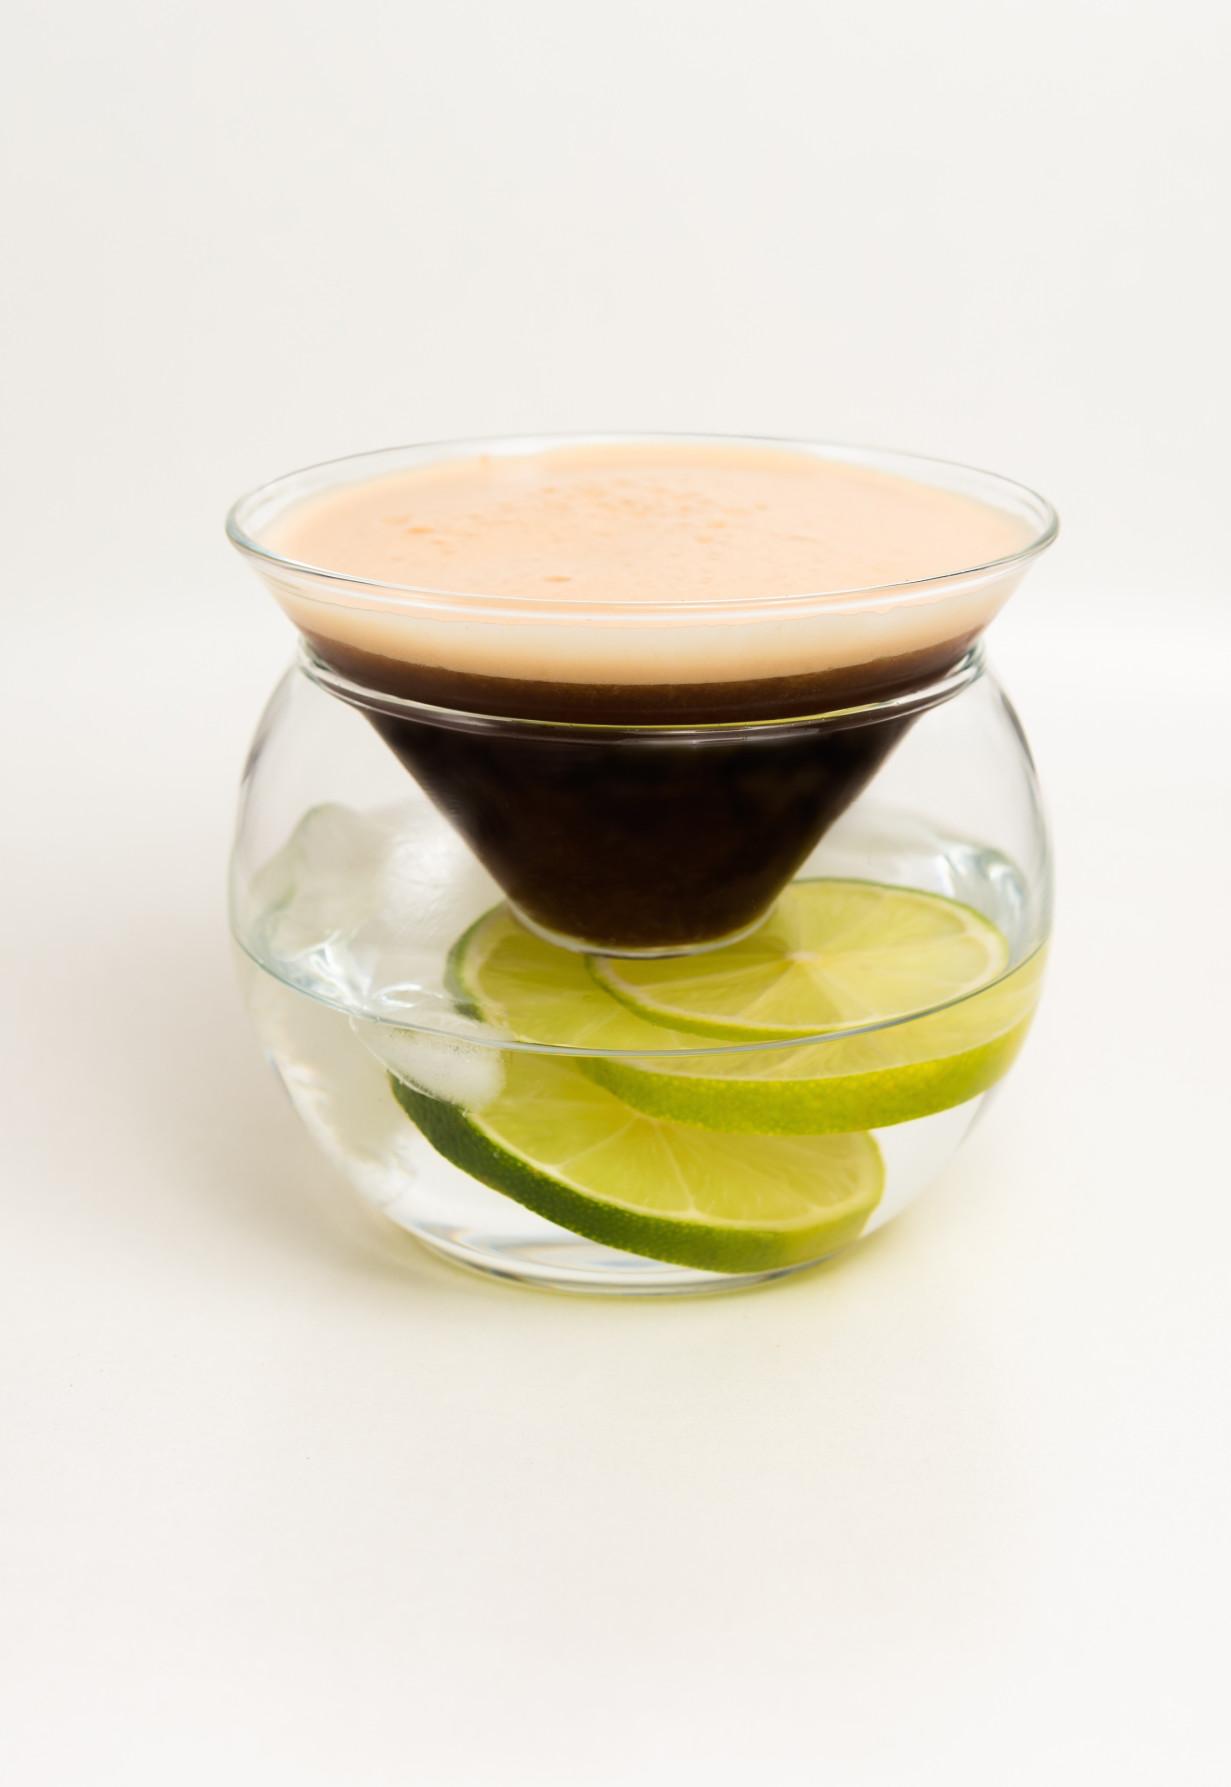 Cappuccino Barista kurs utdanning Oslo Espresso Cafe Café Kaffebar Drink Cocktail